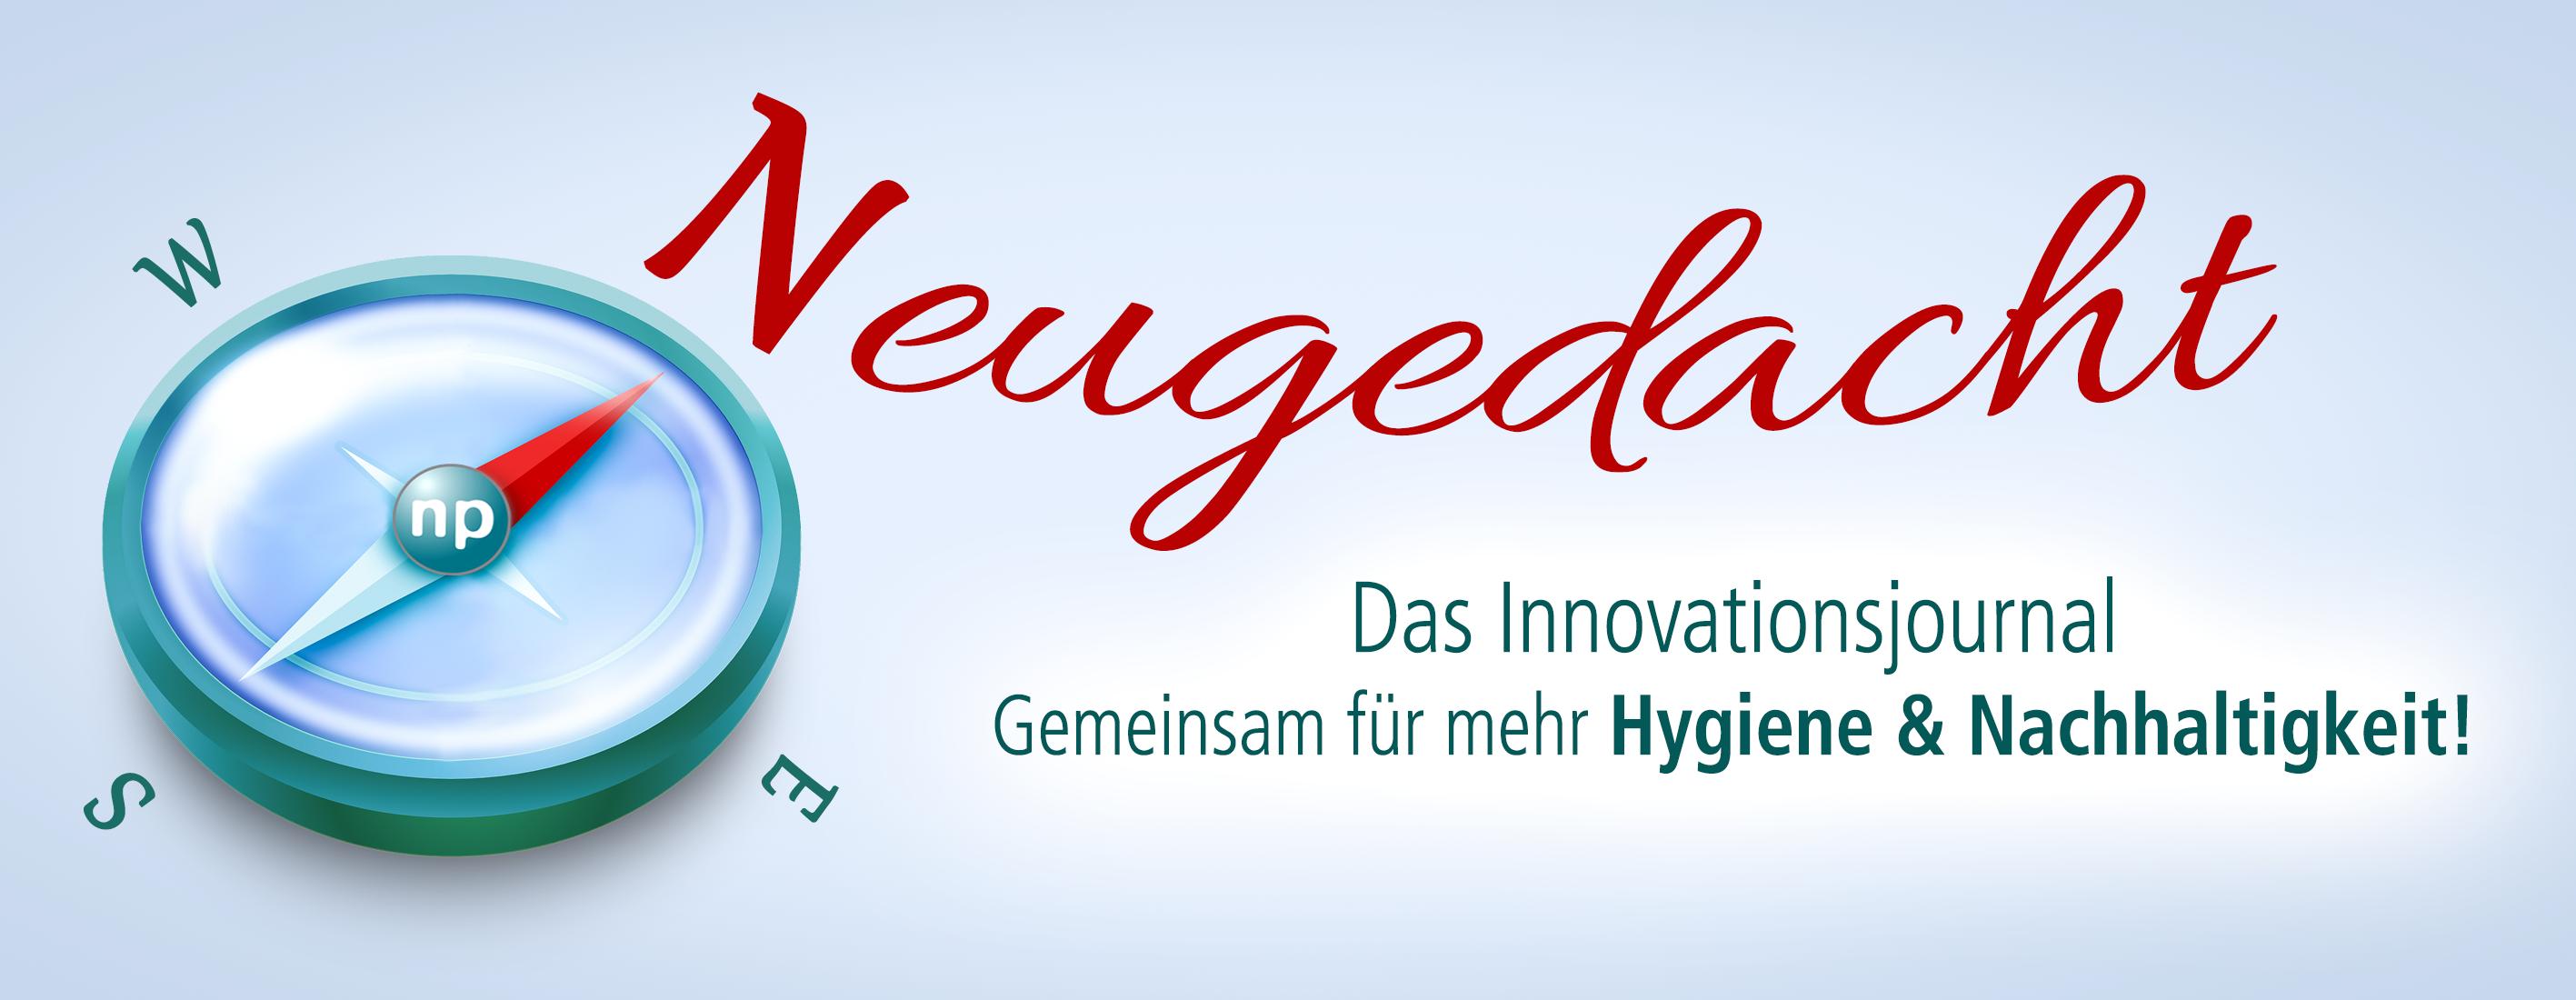 Innovations Journal Nachhaltigkeit Hygiene